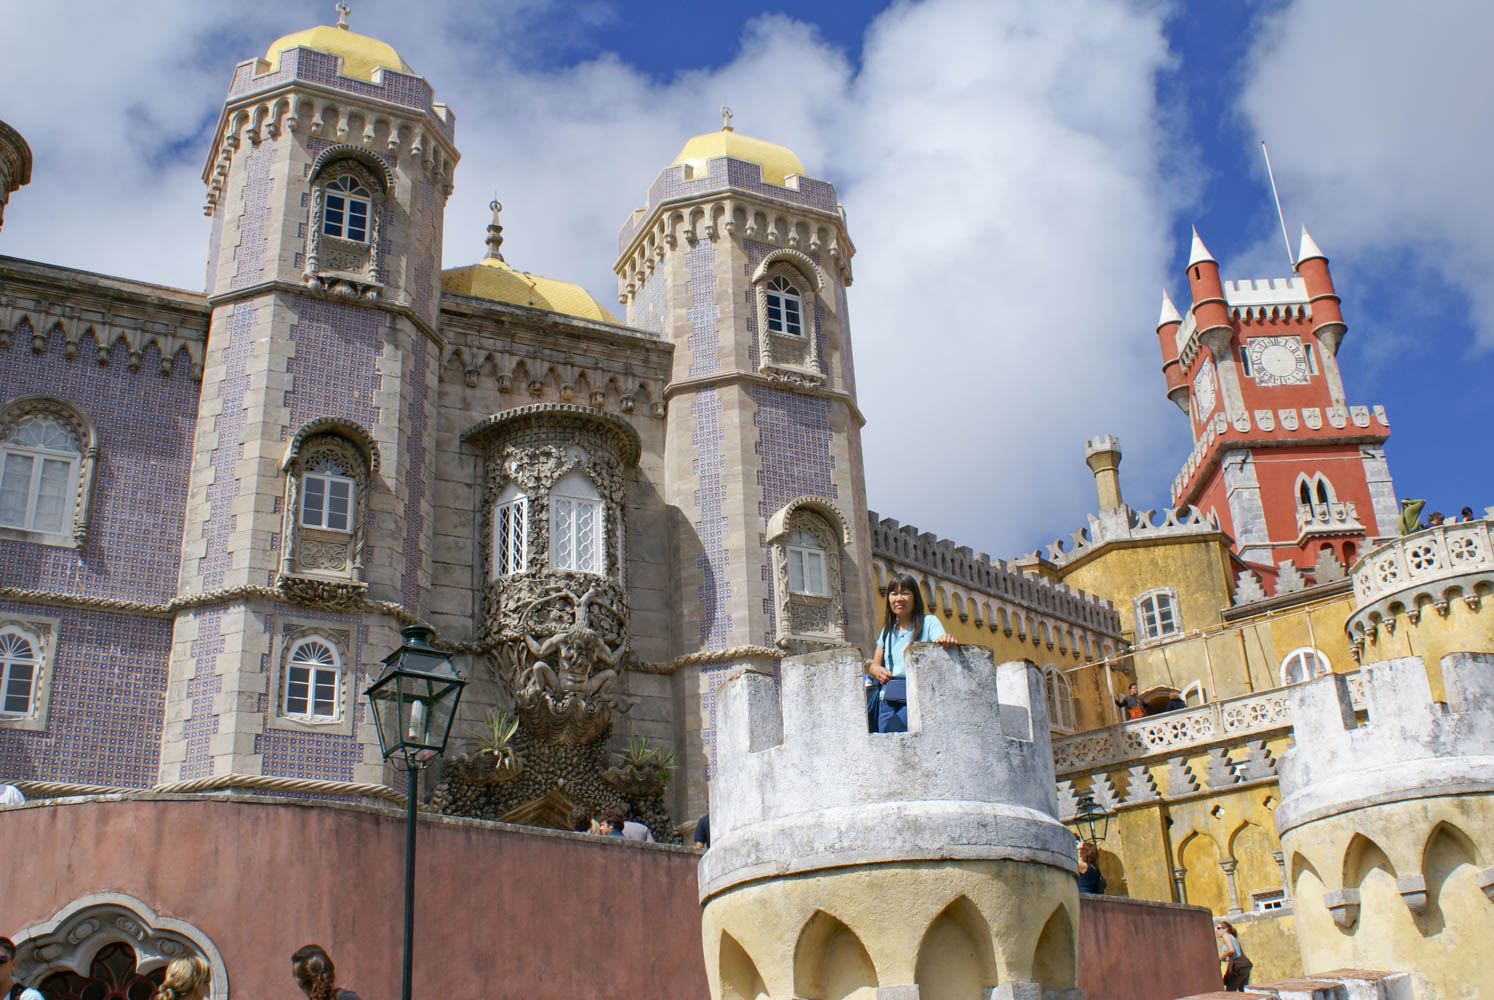 Castelo de Pena